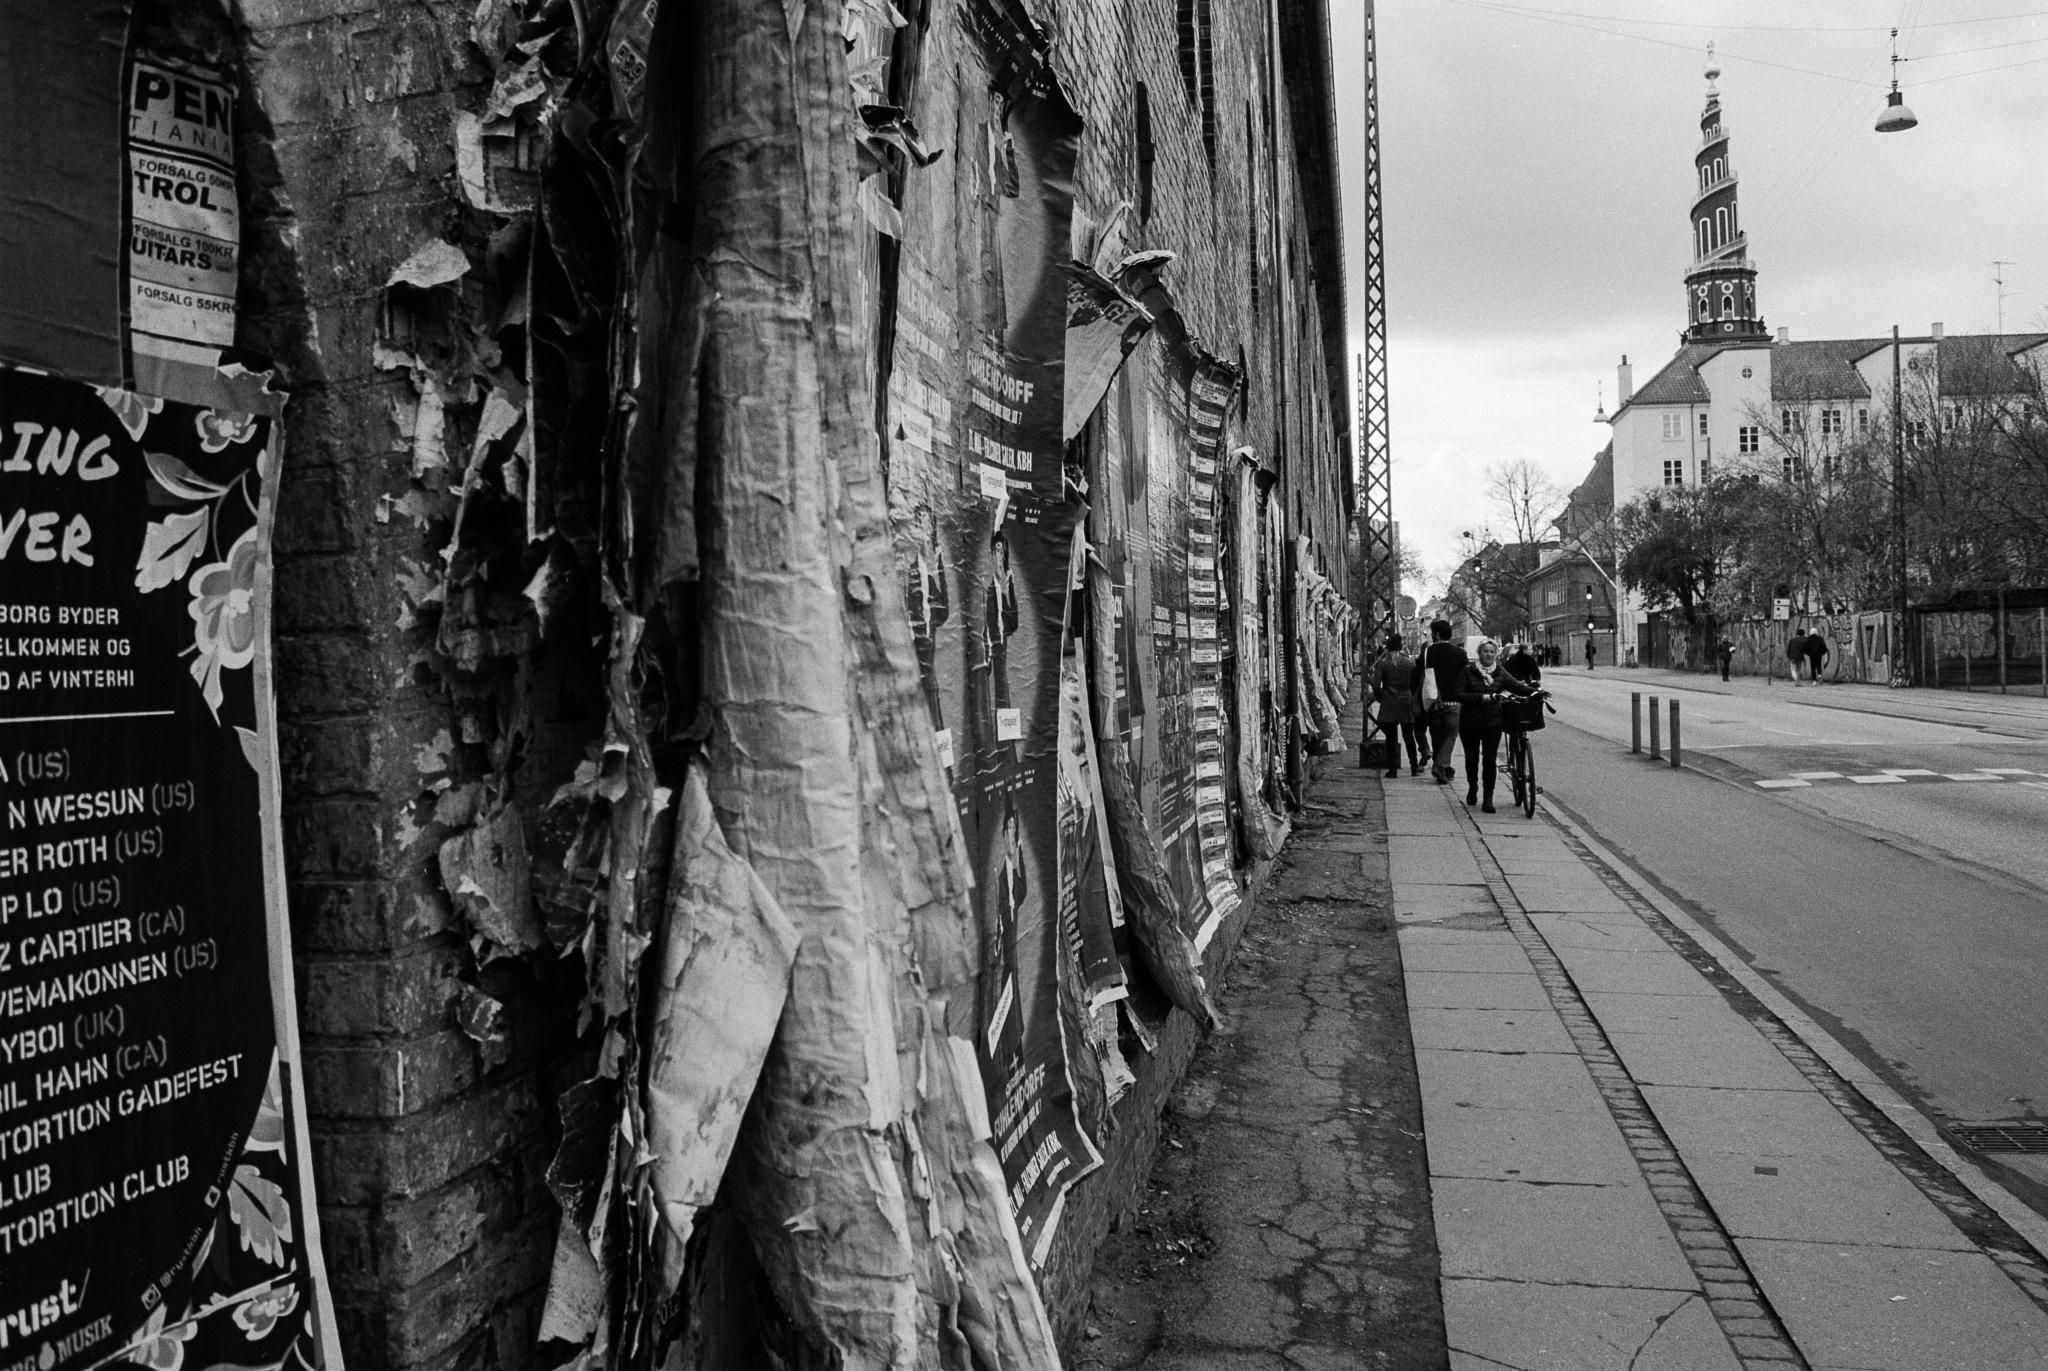 Photo in Street Photography #freetown christiania #christiania #freetown #denmark #copenhagen #film #nikon #nikon f3 #ilford fp4 plus #ilford fp4 #ilford #35mm #street photography #black and white #john earle #28mm